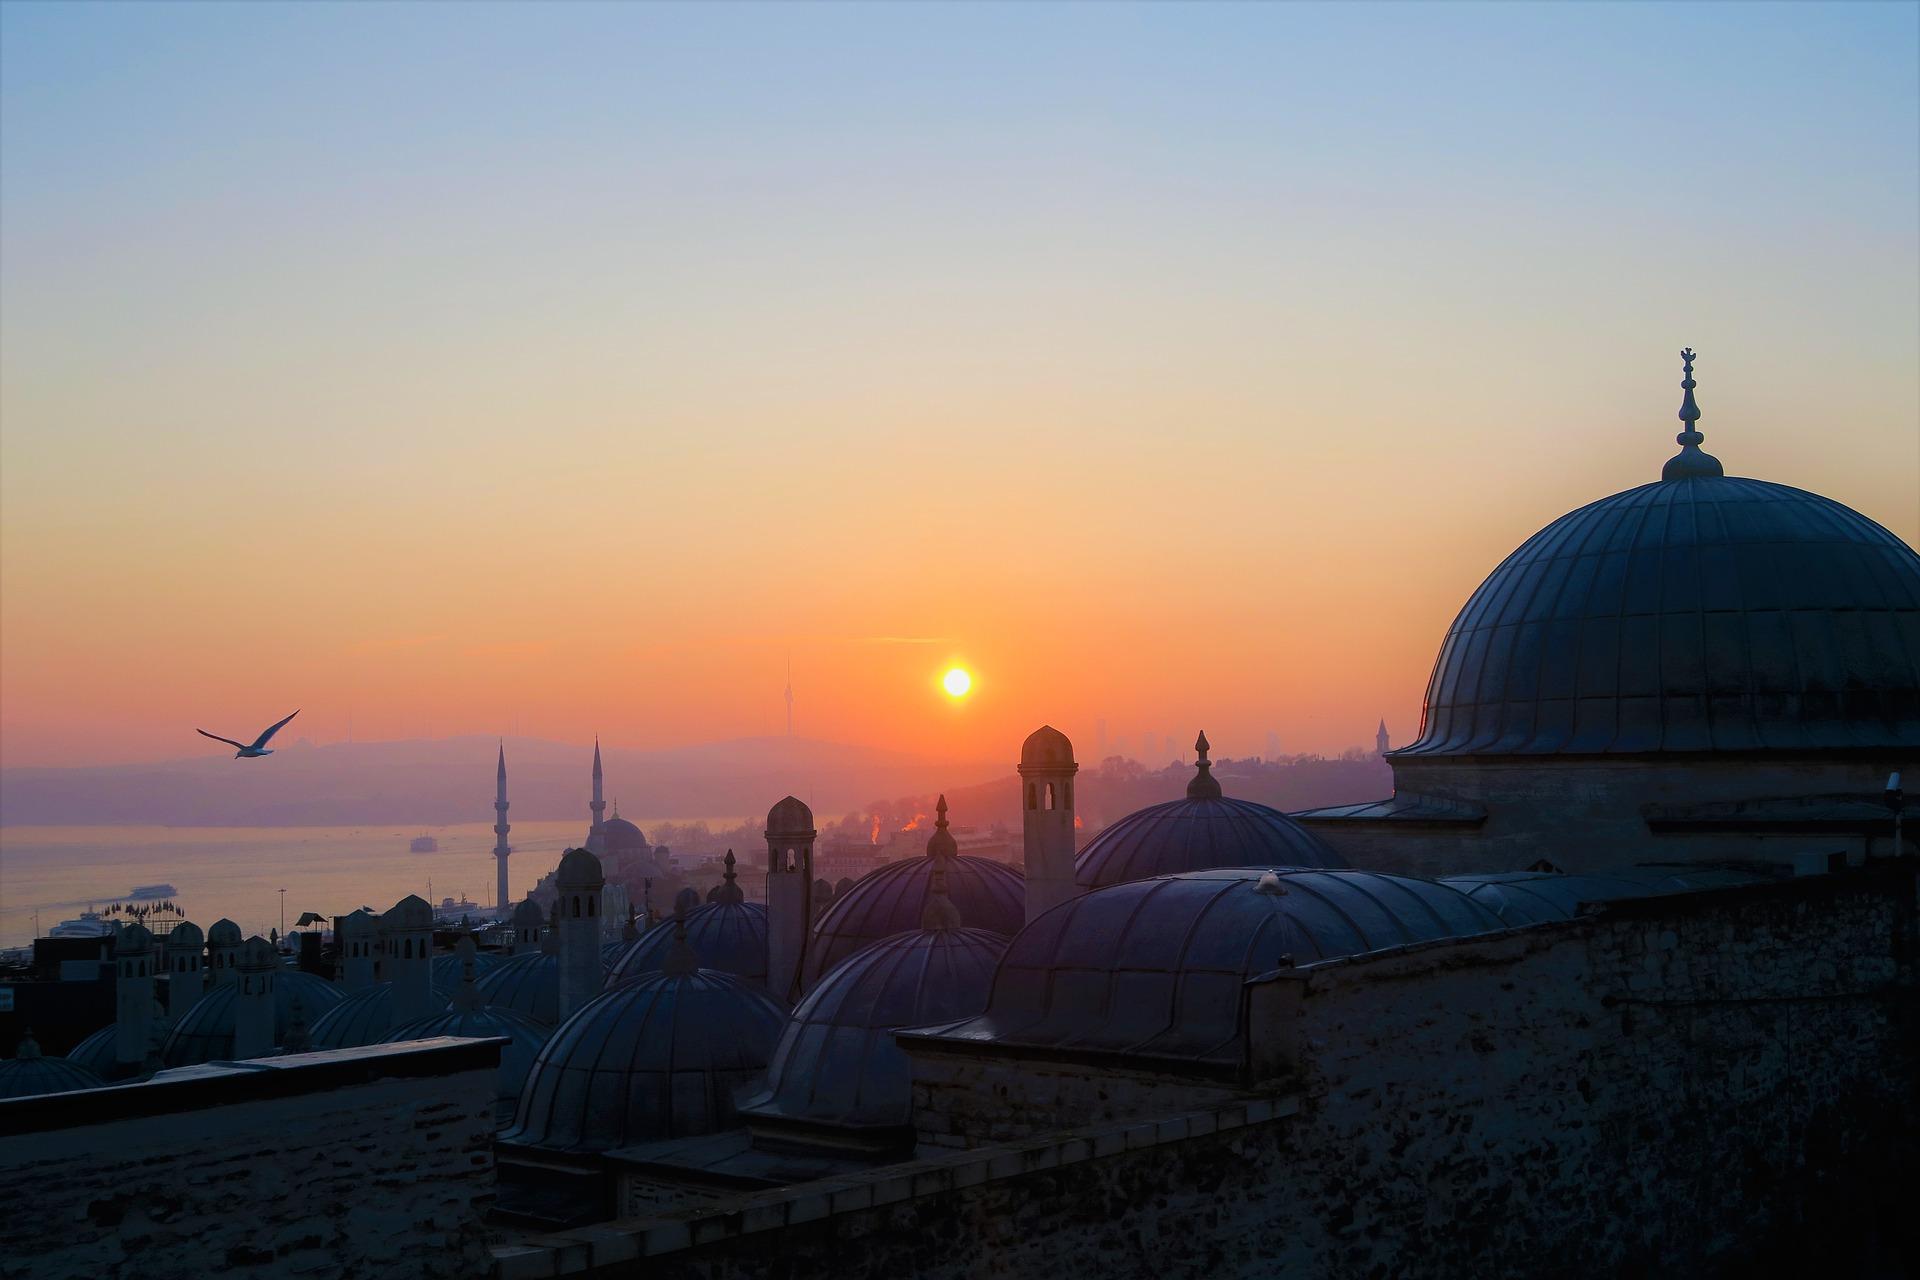 istanbul-4126140_1920.jpg